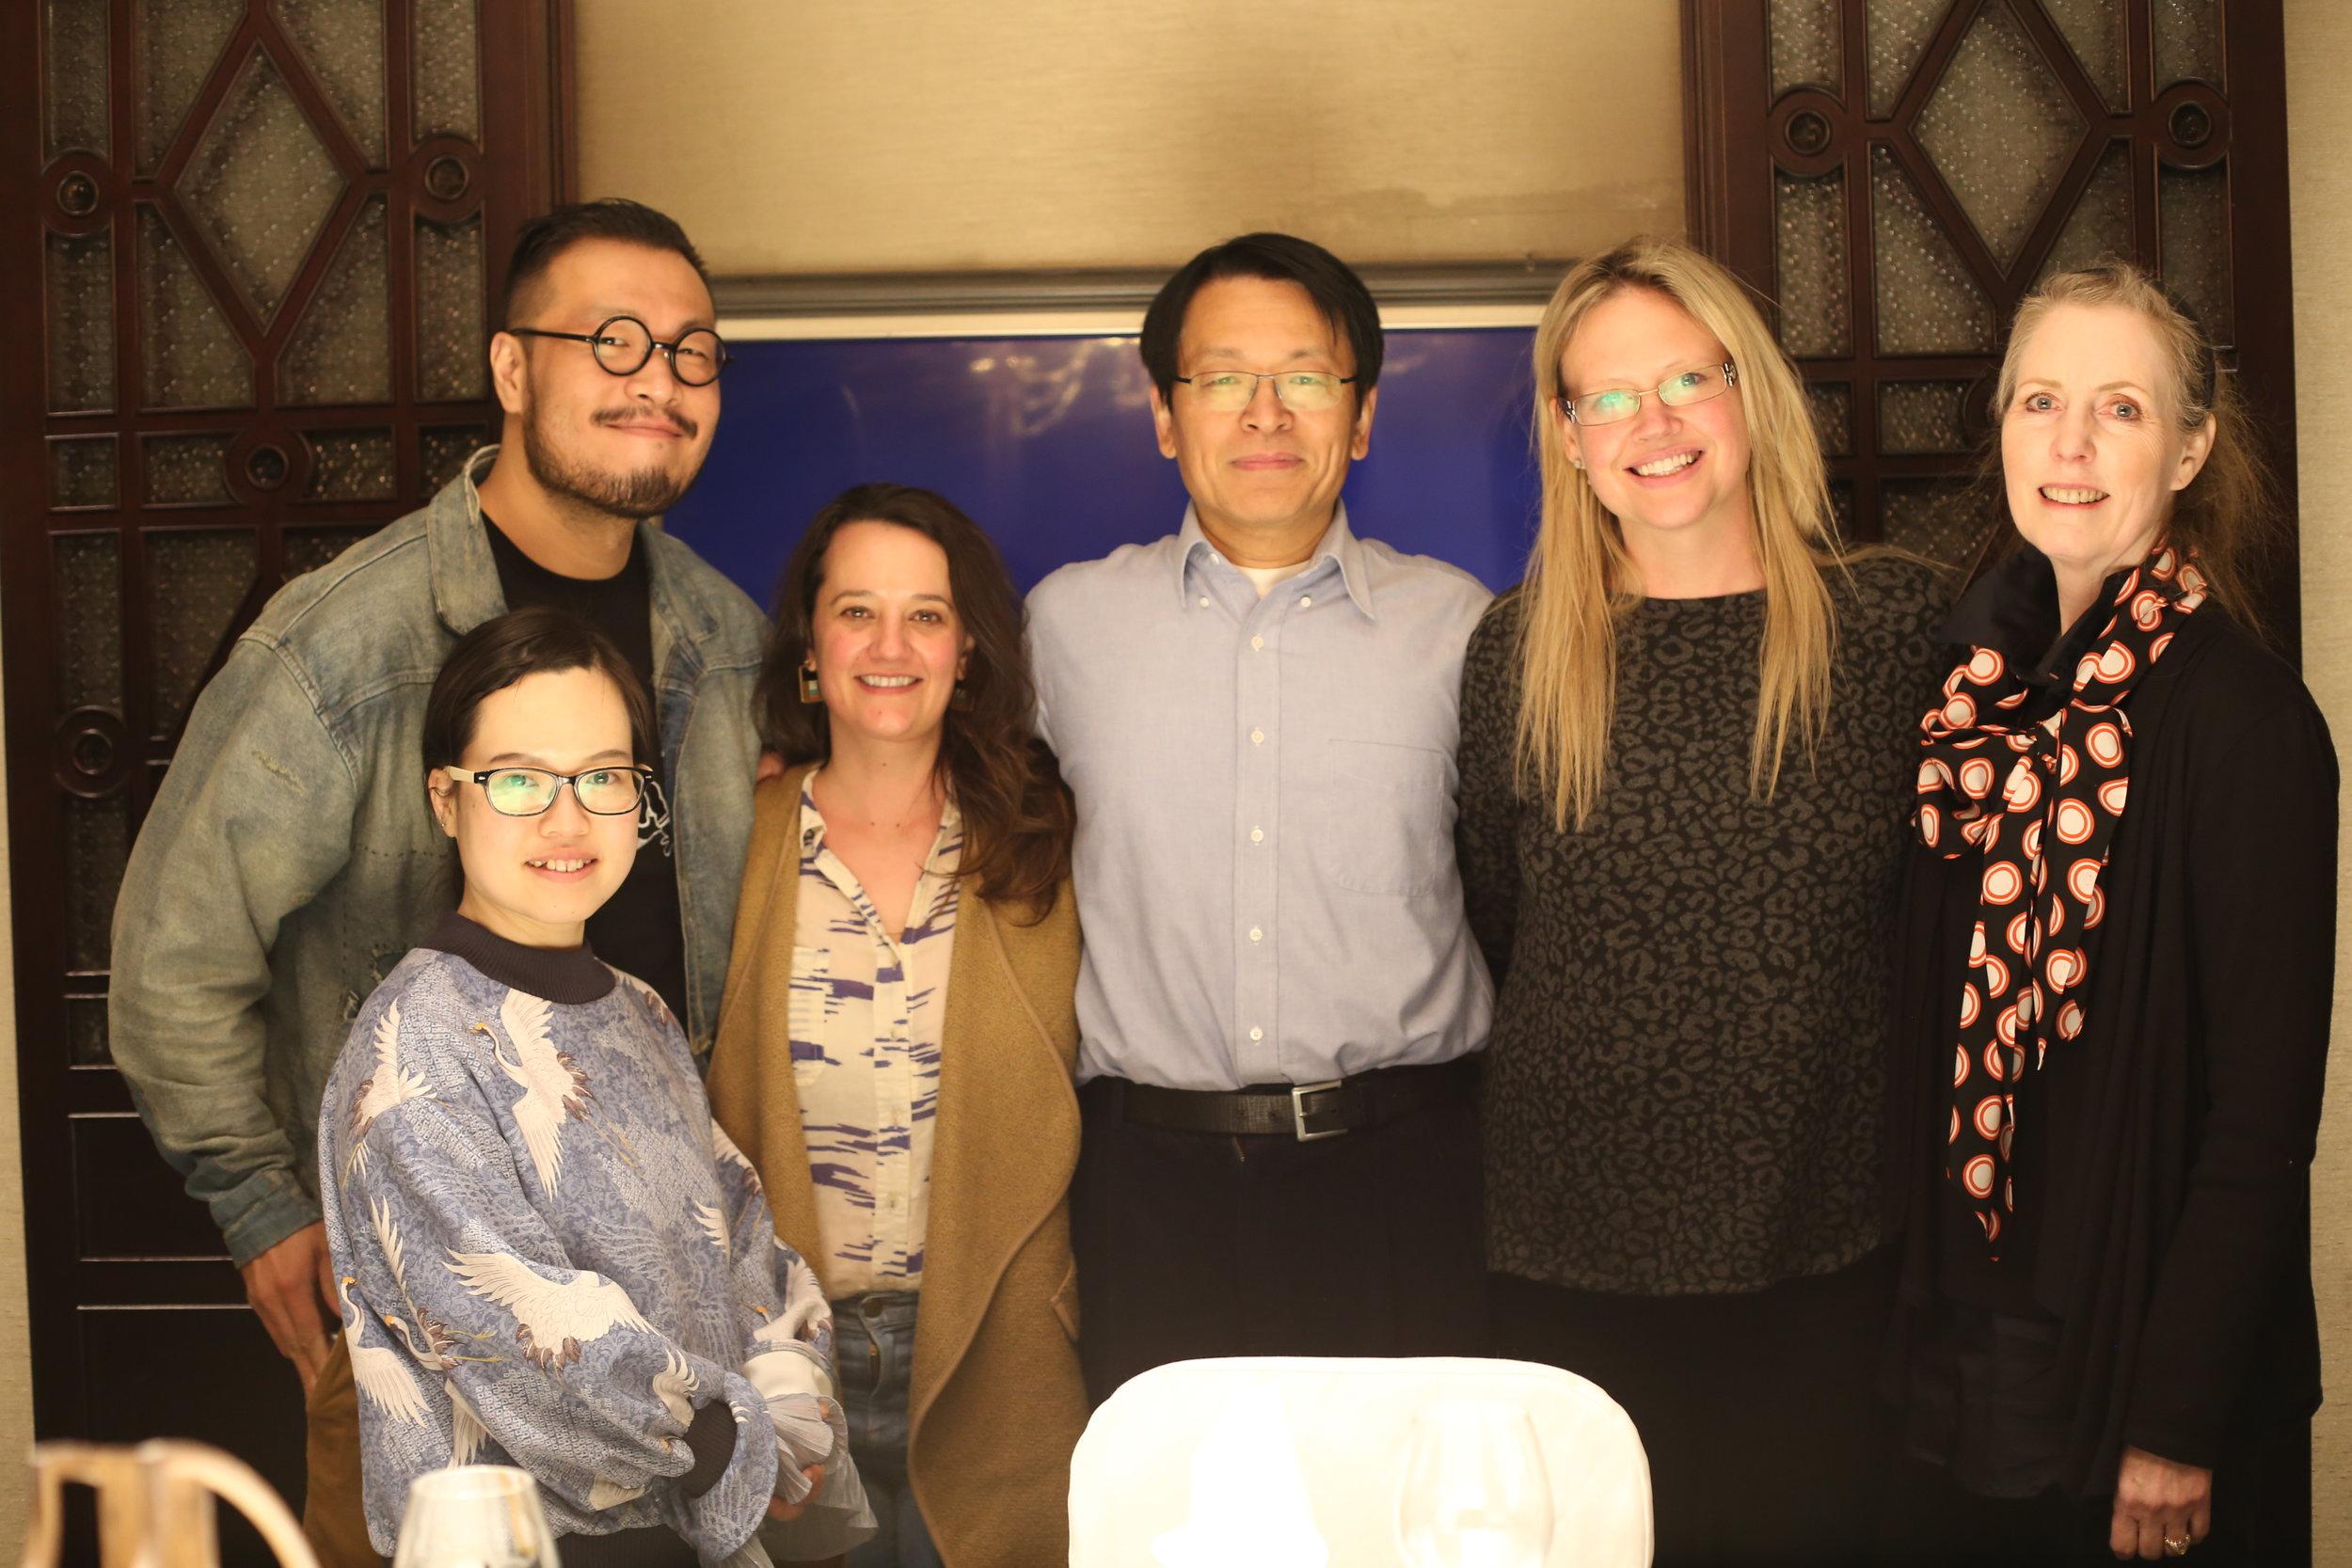 Lulu Bao, Willie Yao, friend Christy Capano, Ma Xinle, Monique, and Kathrine